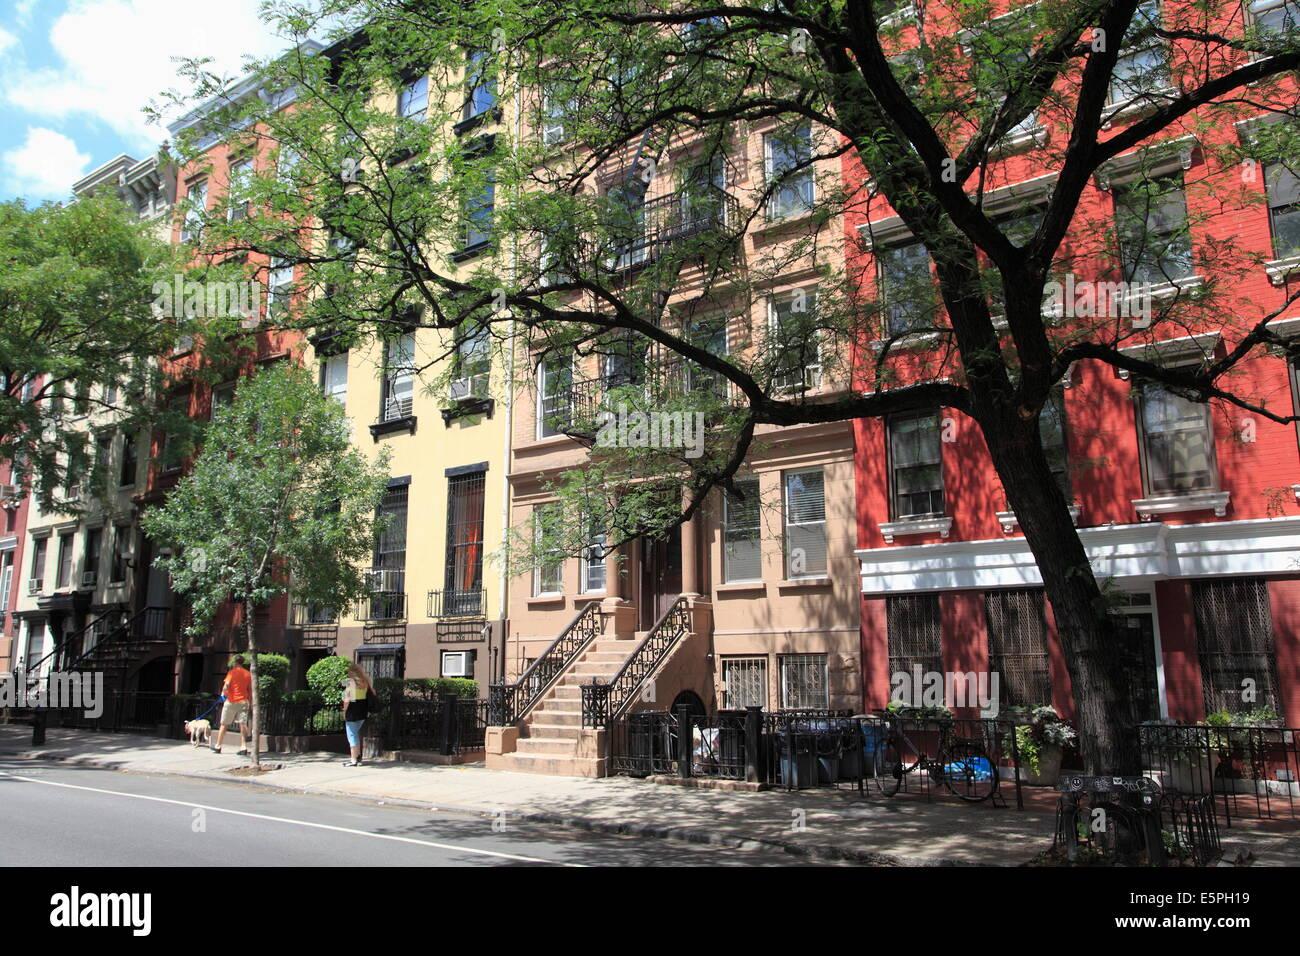 Apartment Buildings, East Village, Alphabet City, Manhattan, New York City,  United States Of America, North America